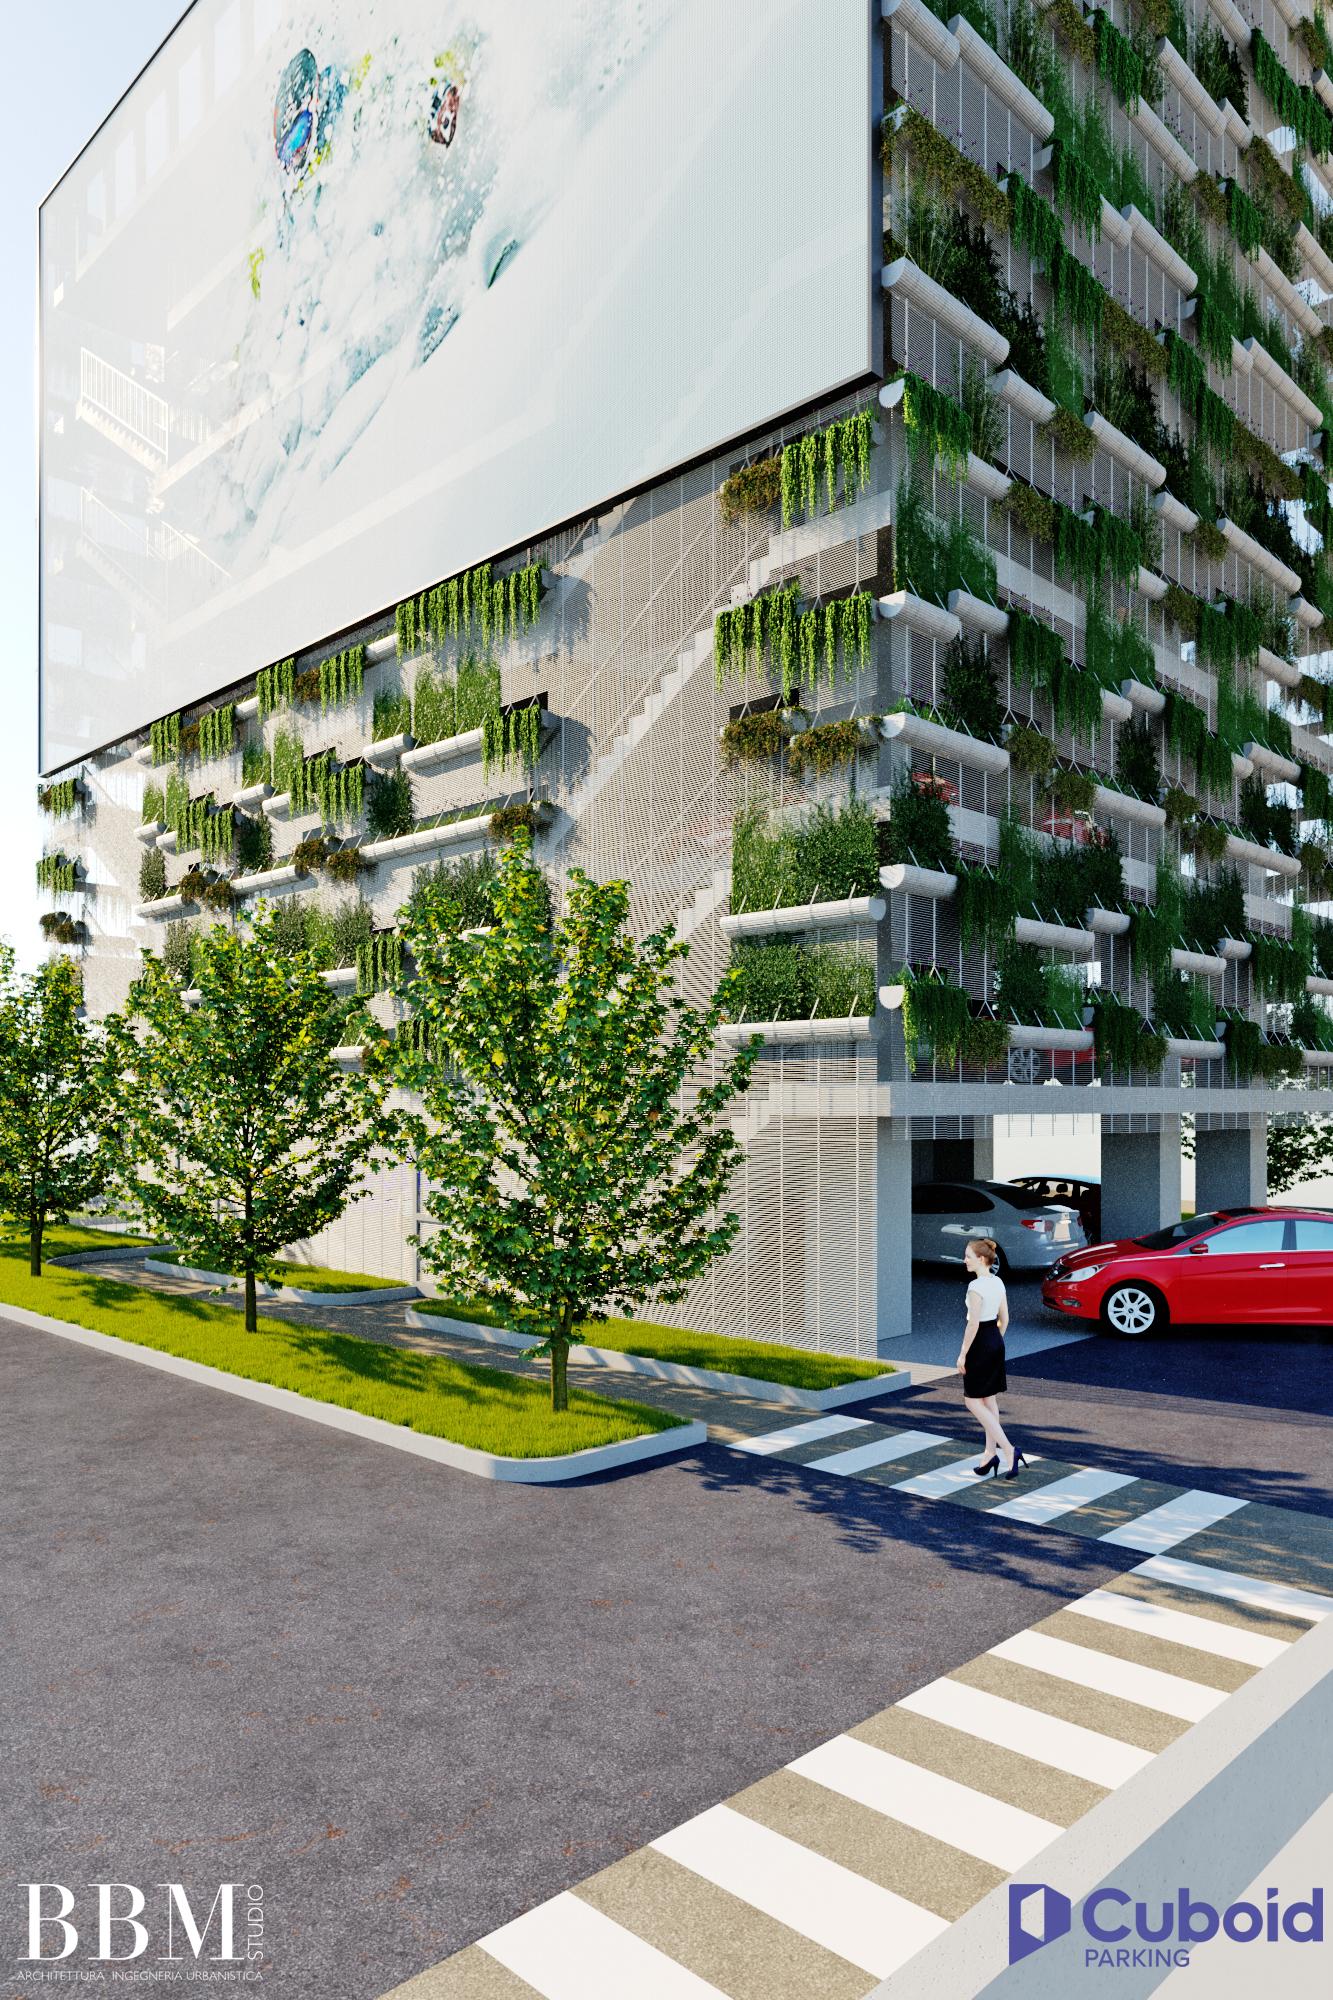 Cuboid Parking - Cuboid Zugang und Fassade